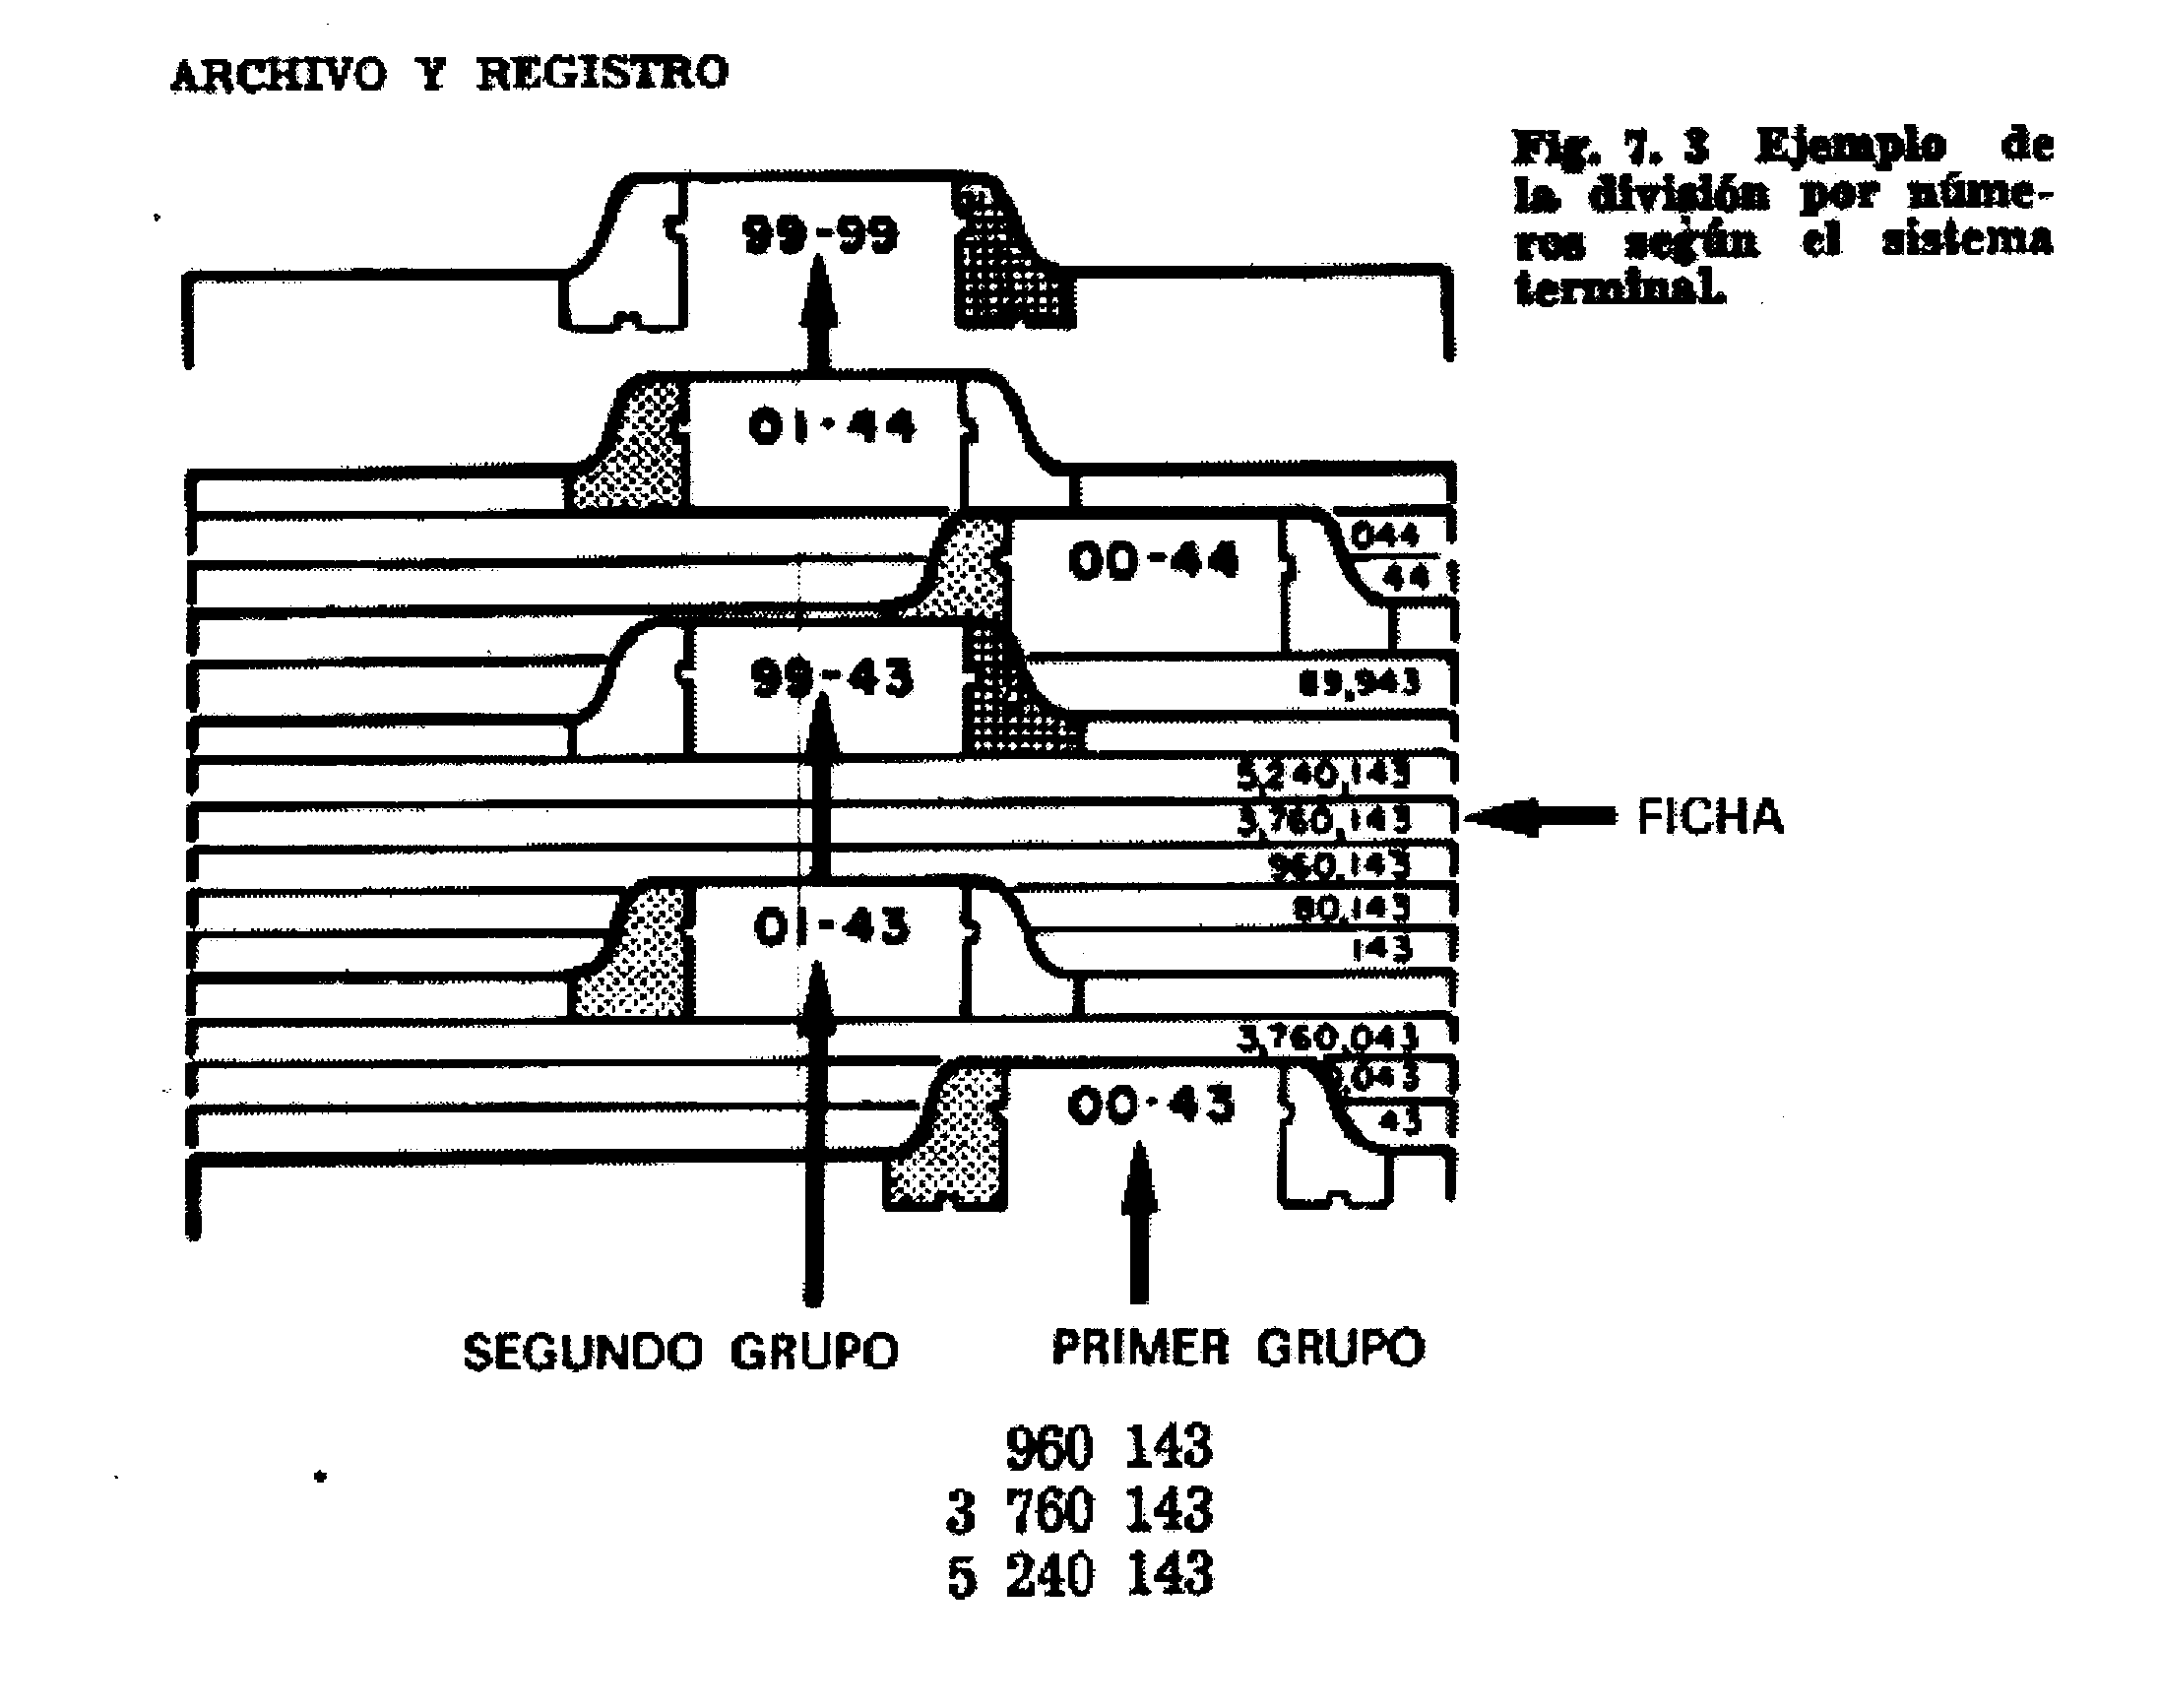 Organización de archivos de oficina técnica